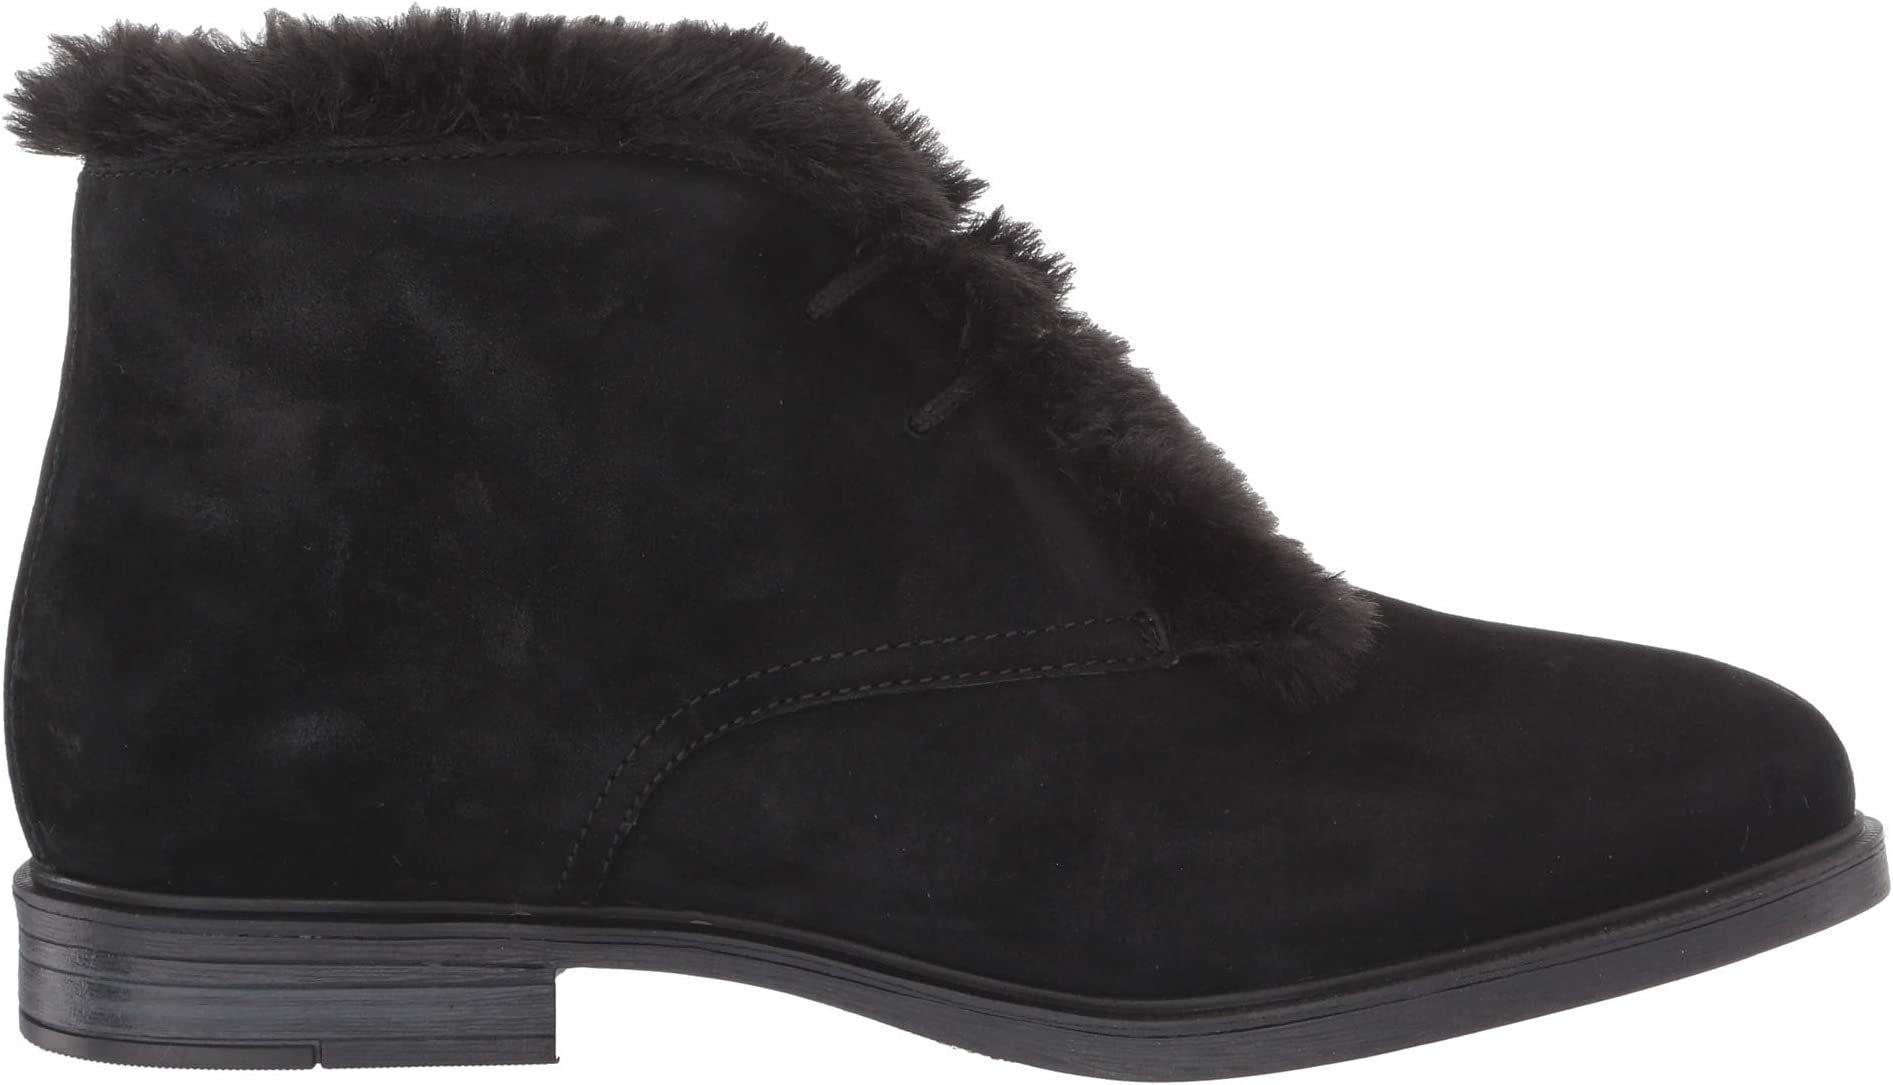 Hush Puppies Bailey Faux Fur Chukka | Women's shoes | 2020 Newest